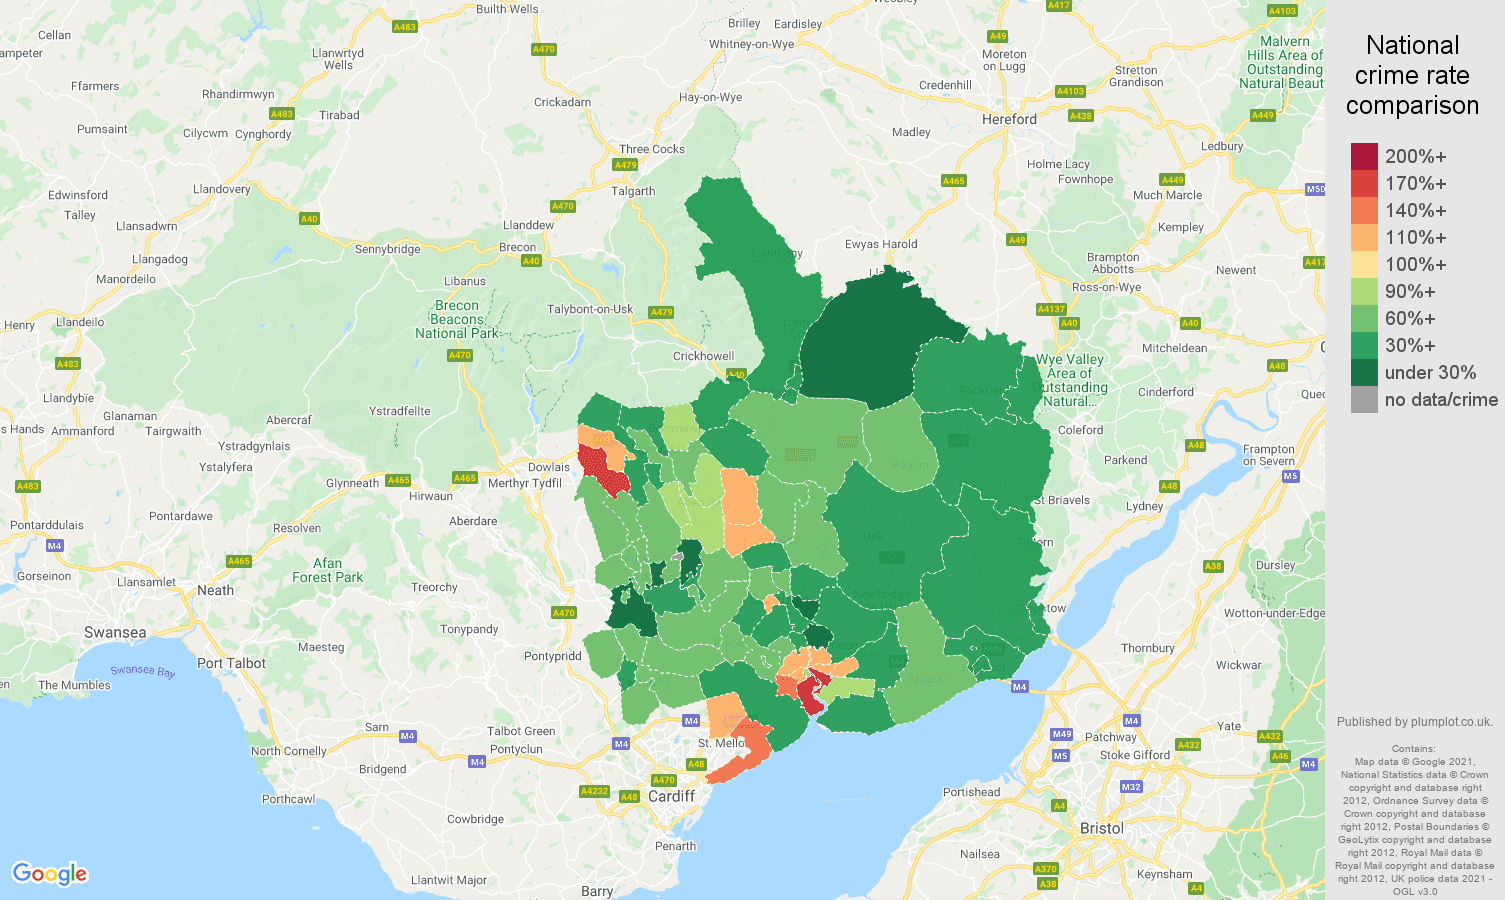 Gwent vehicle crime rate comparison map